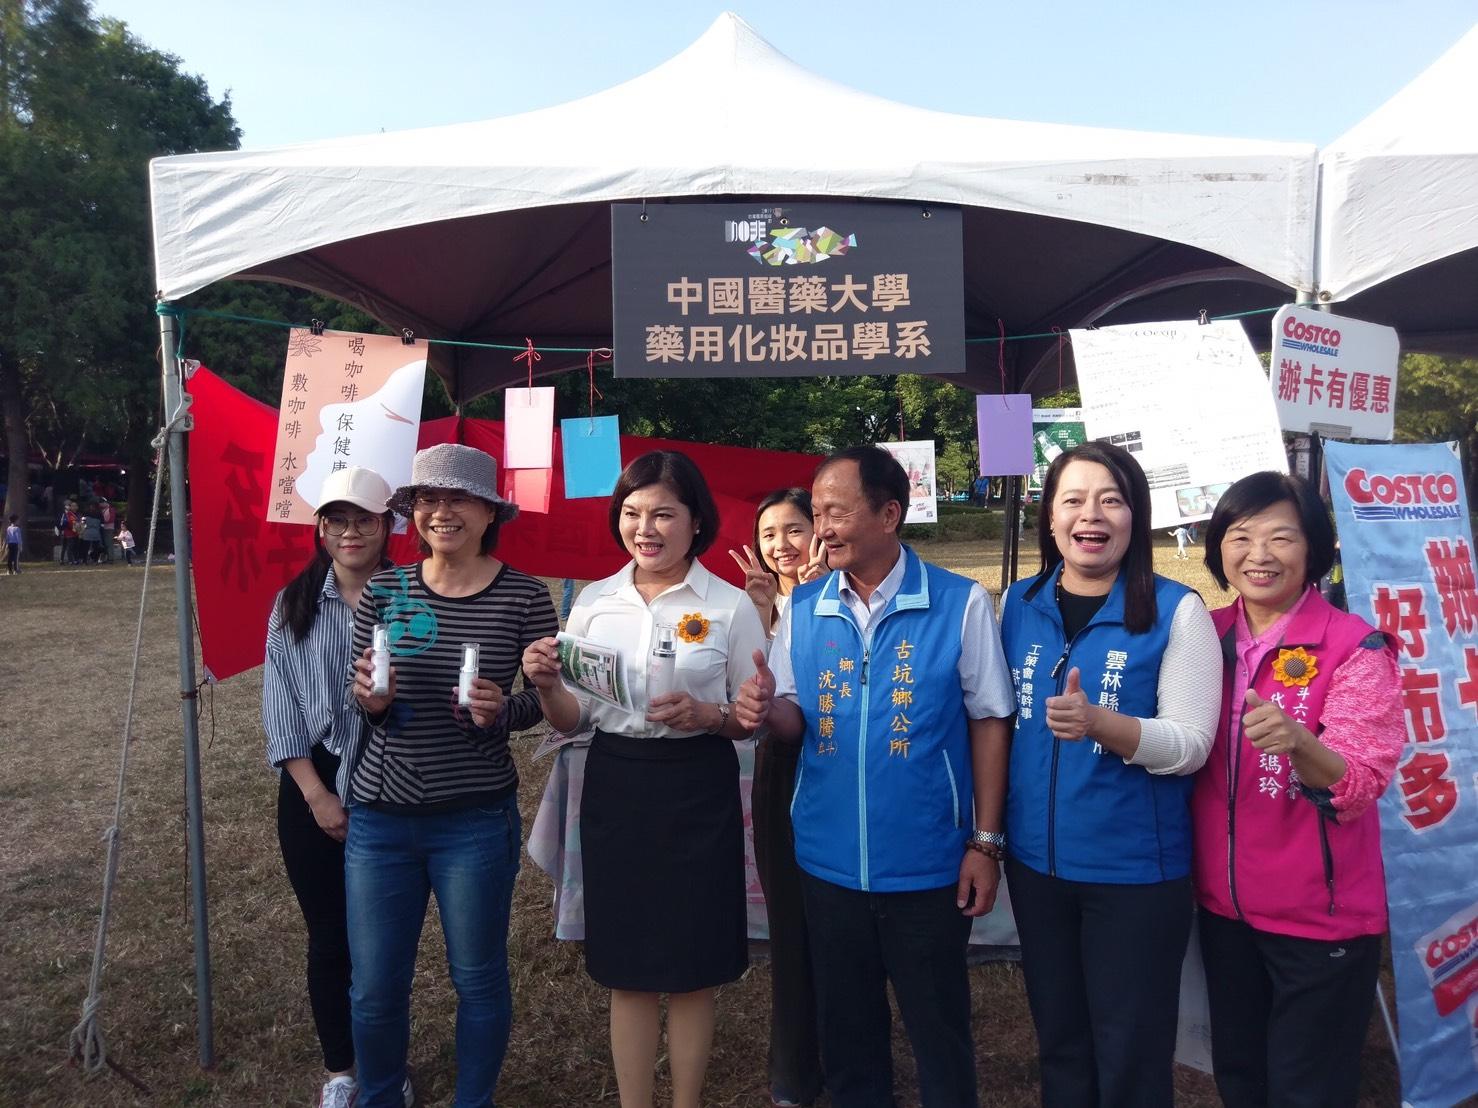 Ms. Li-Shang Chang,MagistrateofYunlin County, visiting the booth of Coexist